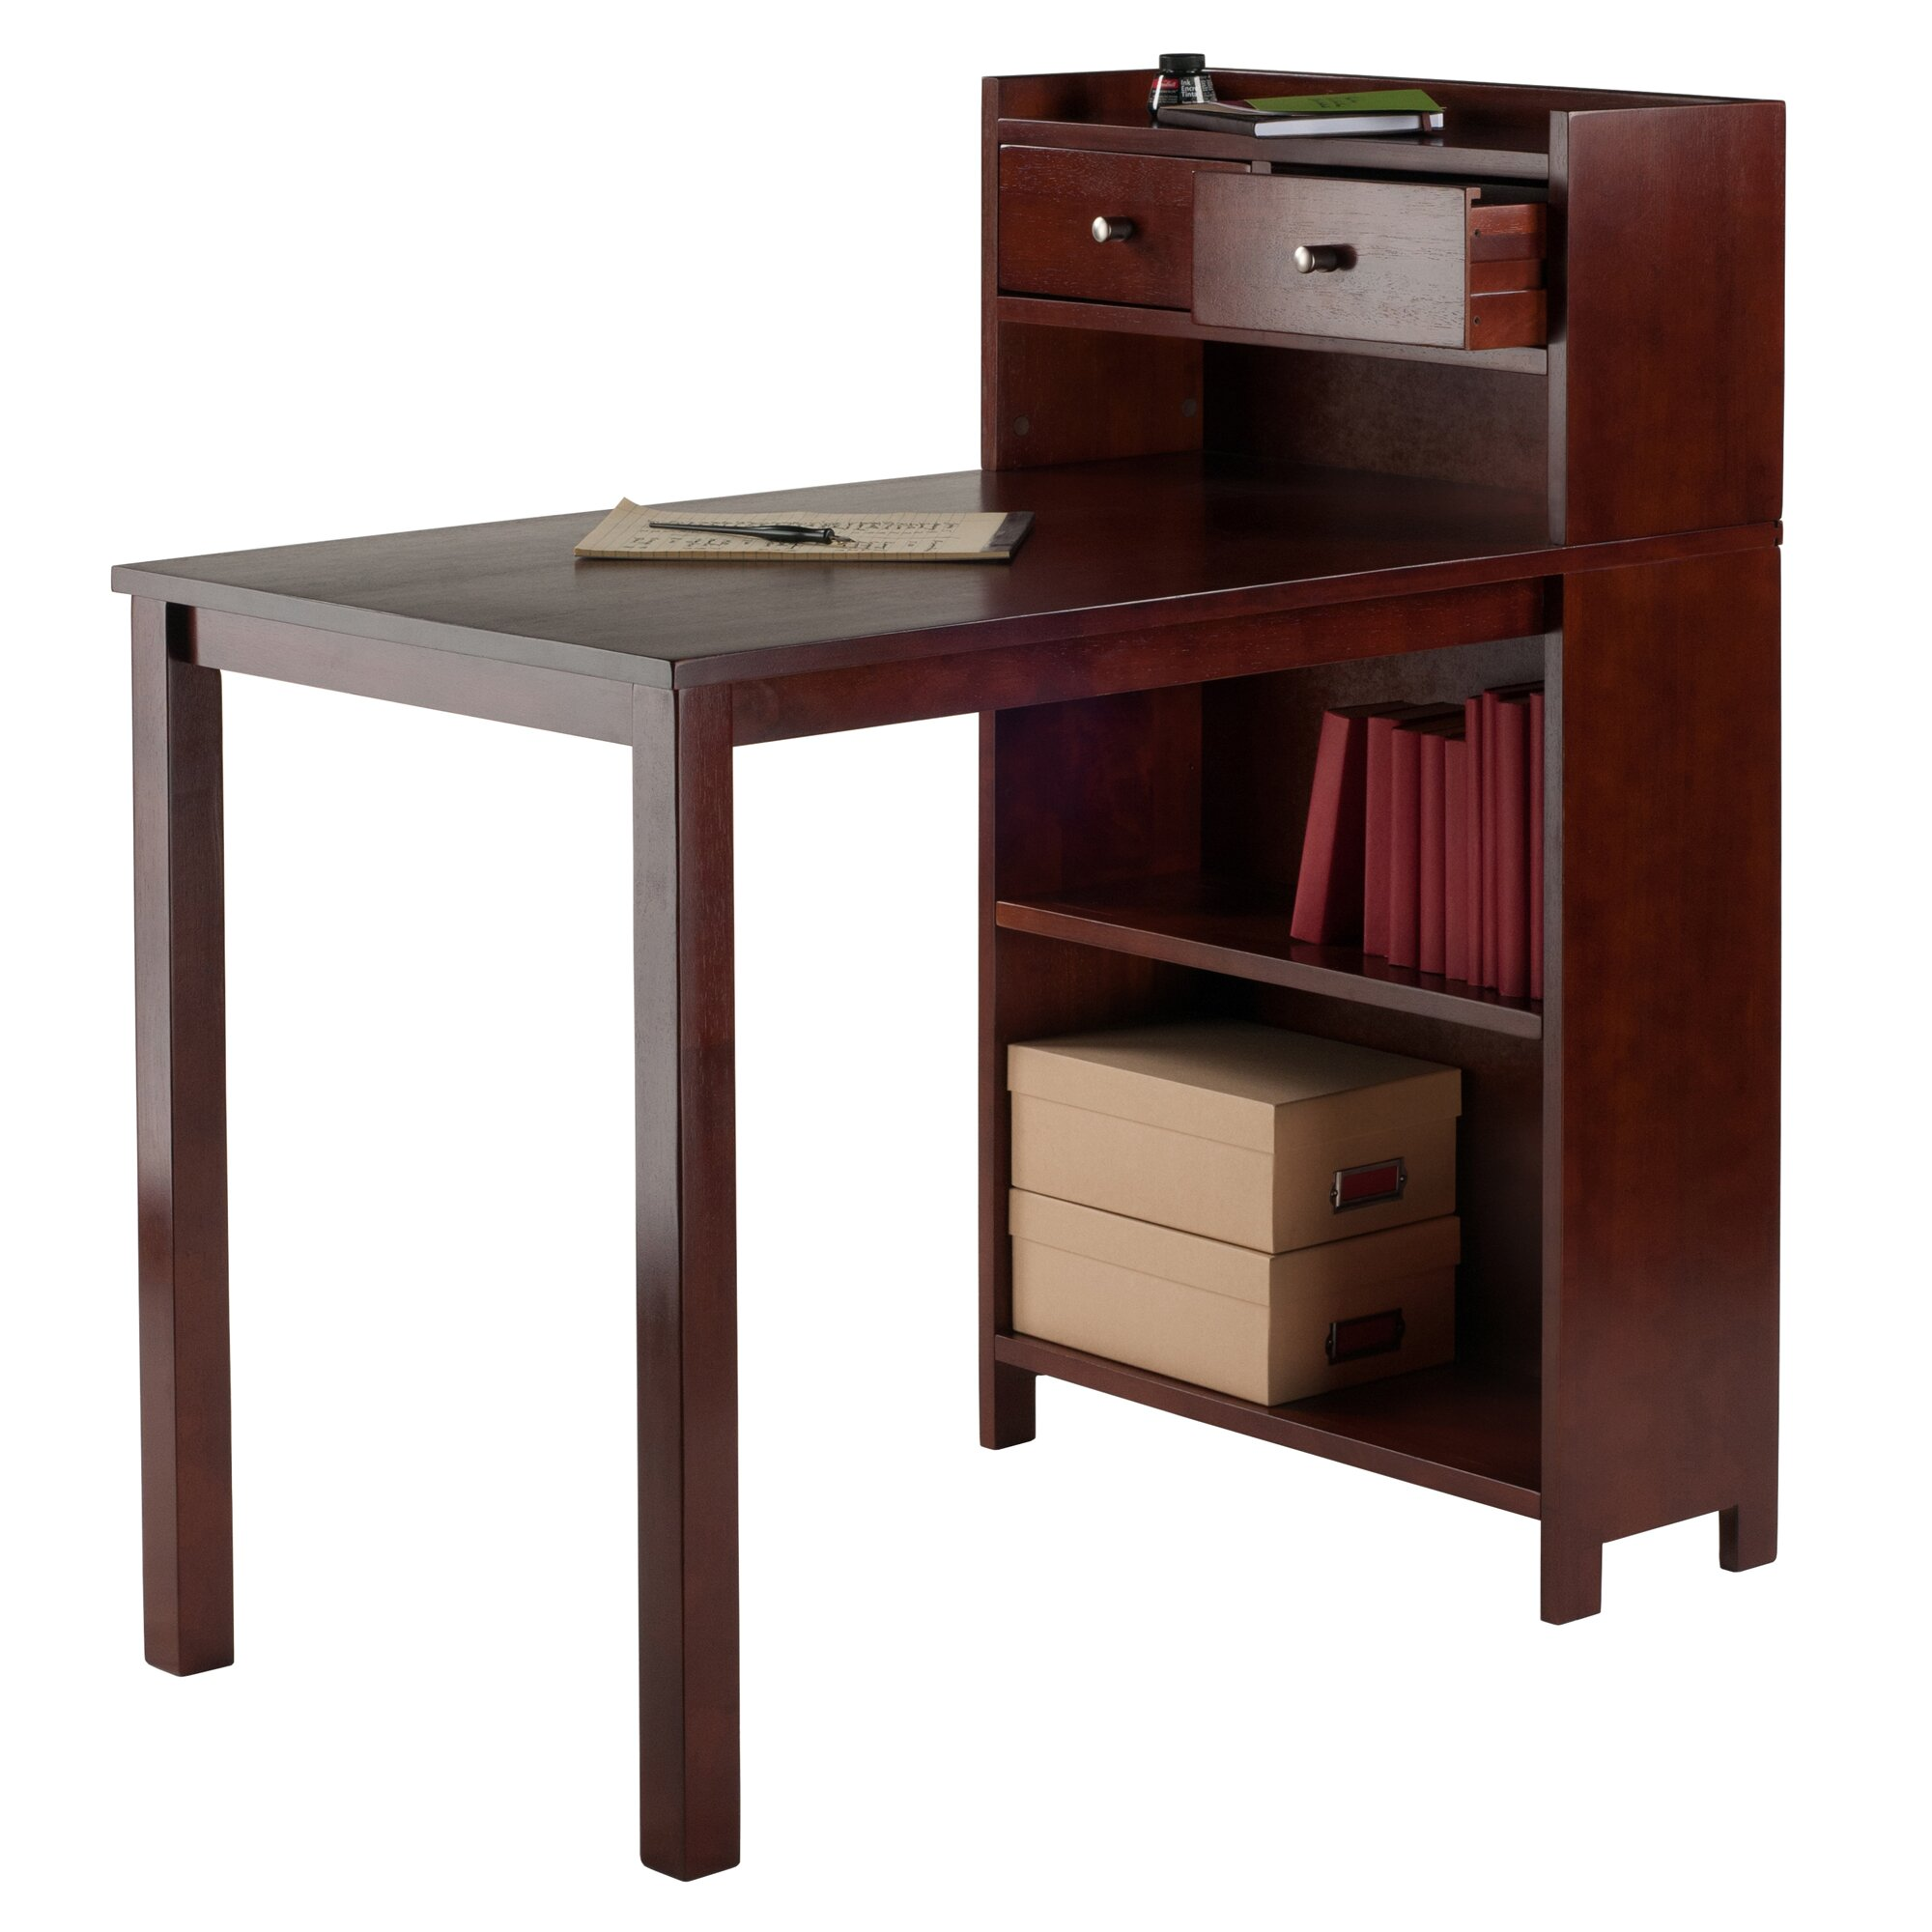 Wonderful image of Latitude Run Mason Writing Desk with Storage Shelf Wayfair with #371814 color and 2000x2000 pixels